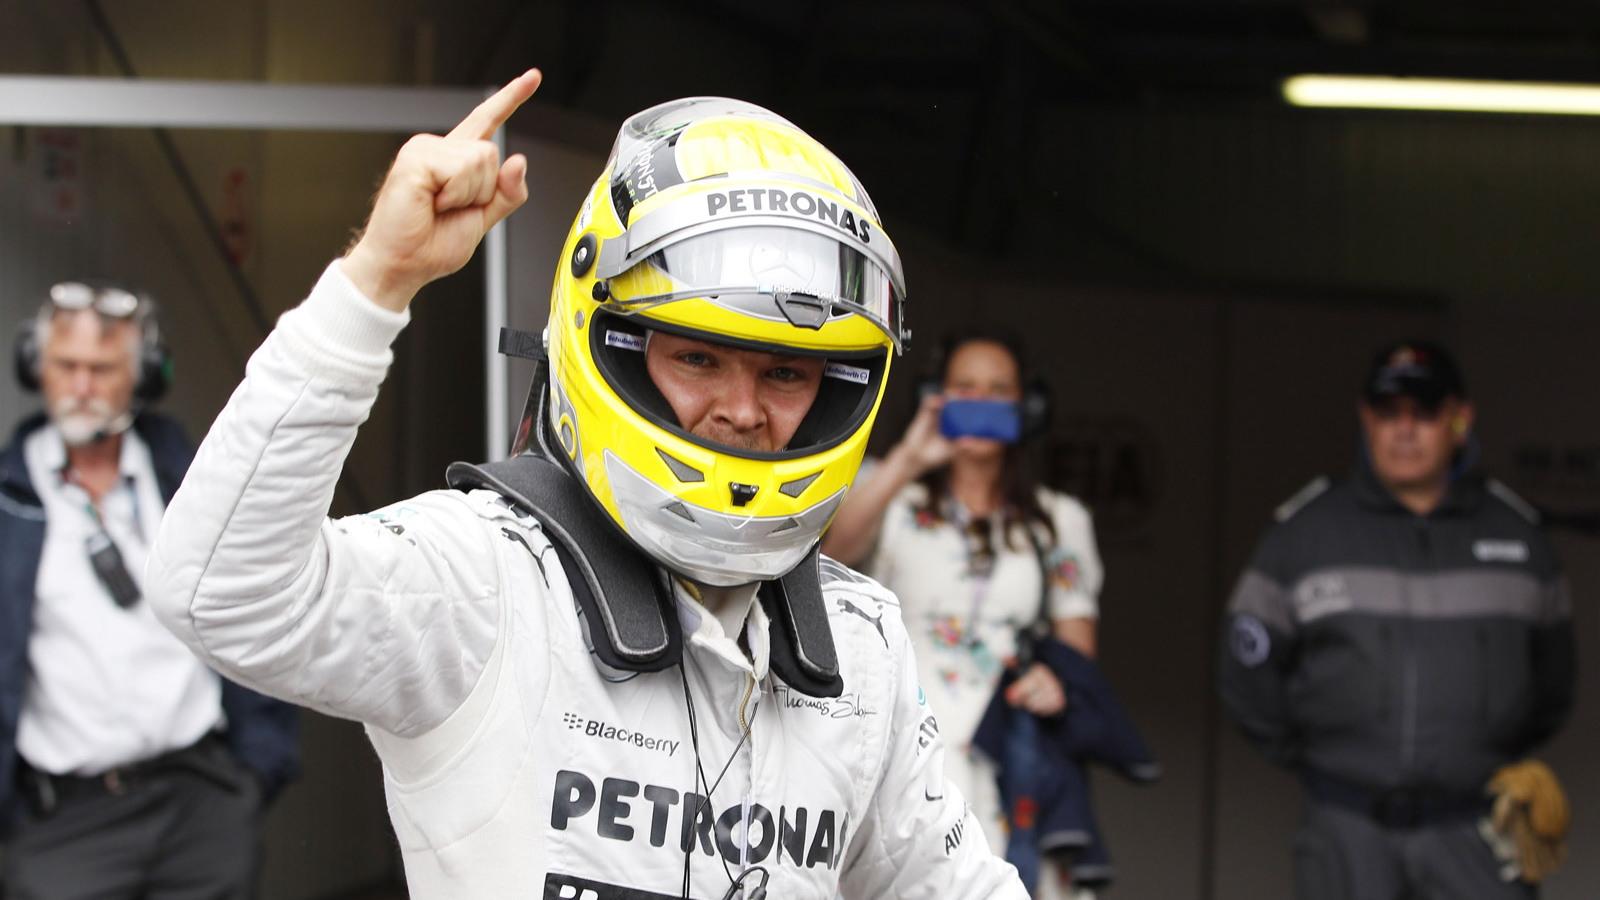 Mercedes AMG's Nico Rosberg at the 2013 Formula One Monaco Grand Prix